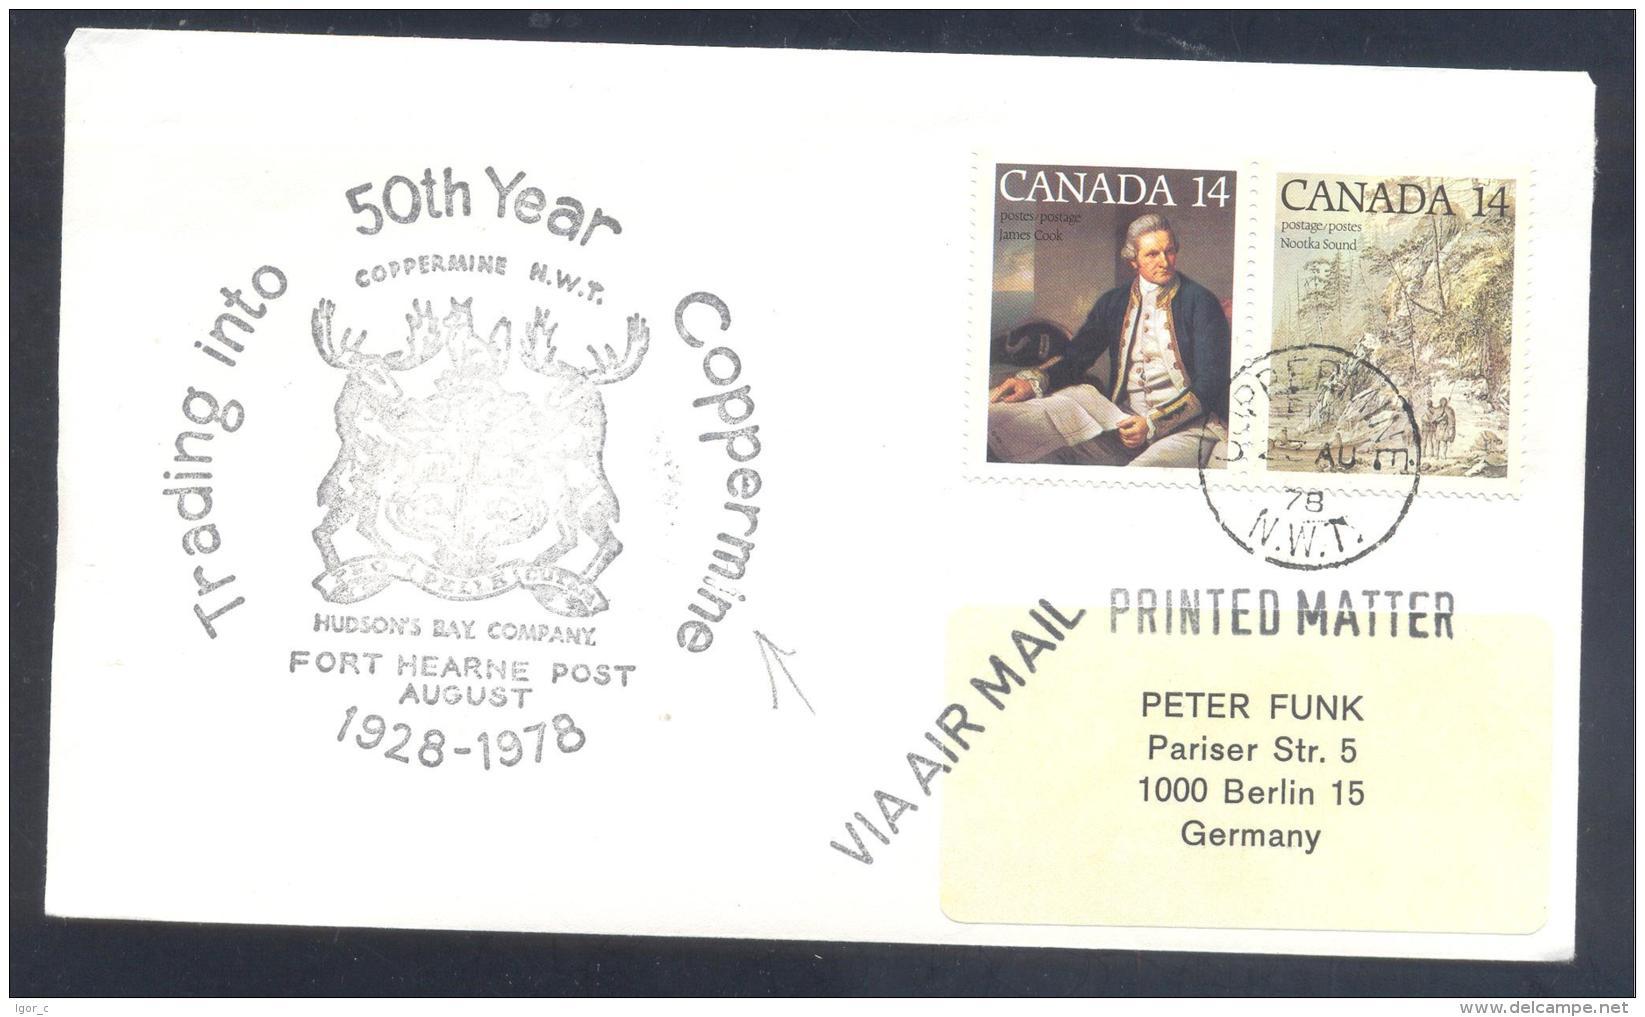 Canada 1978 Cover - Minerals Fosil Fossil Mine Mineralien Paleontolyogy Speleology; Coppermine  Fox Deer - Mineralien